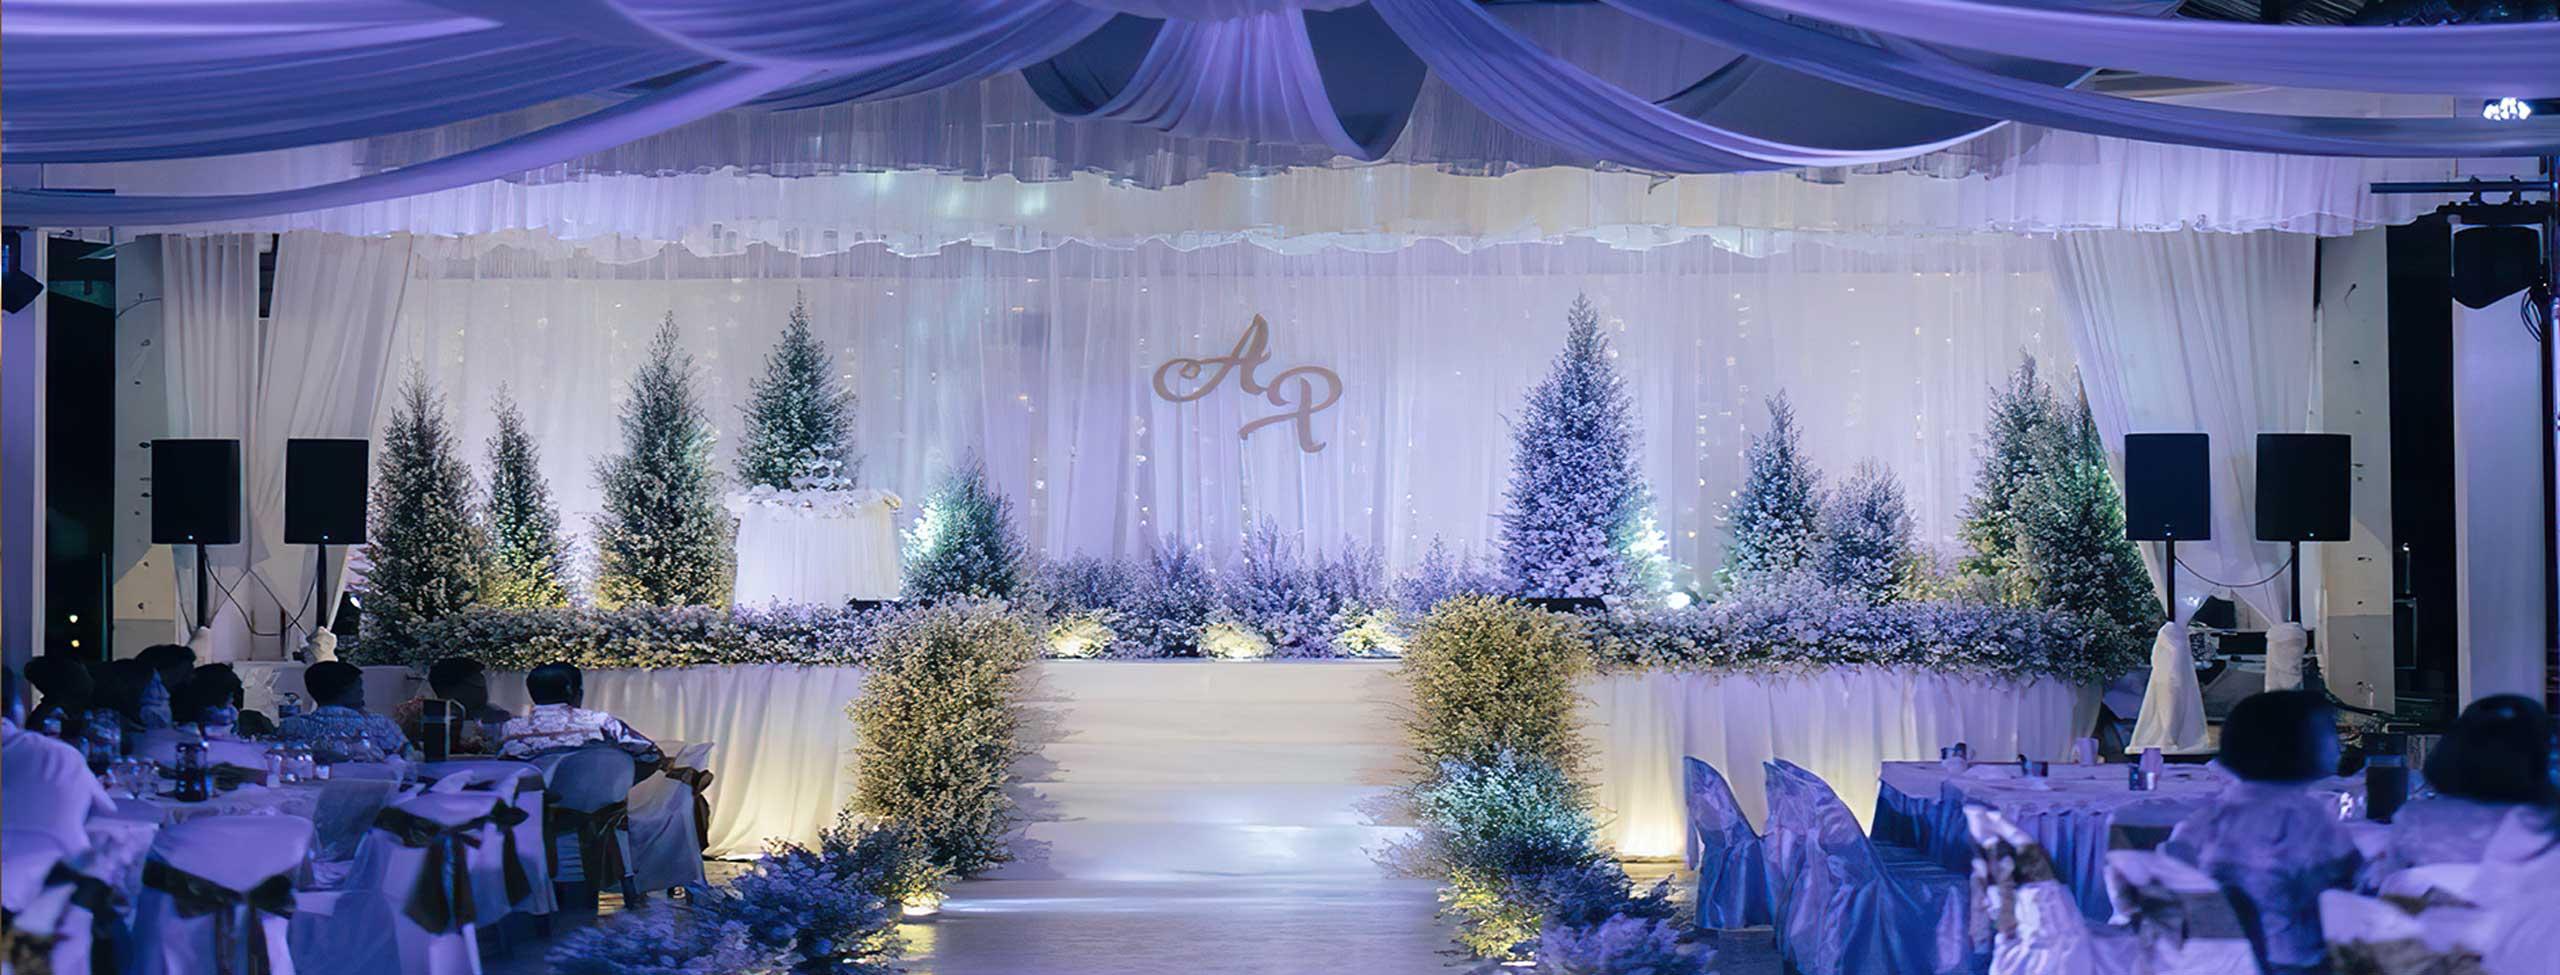 weddingb-3